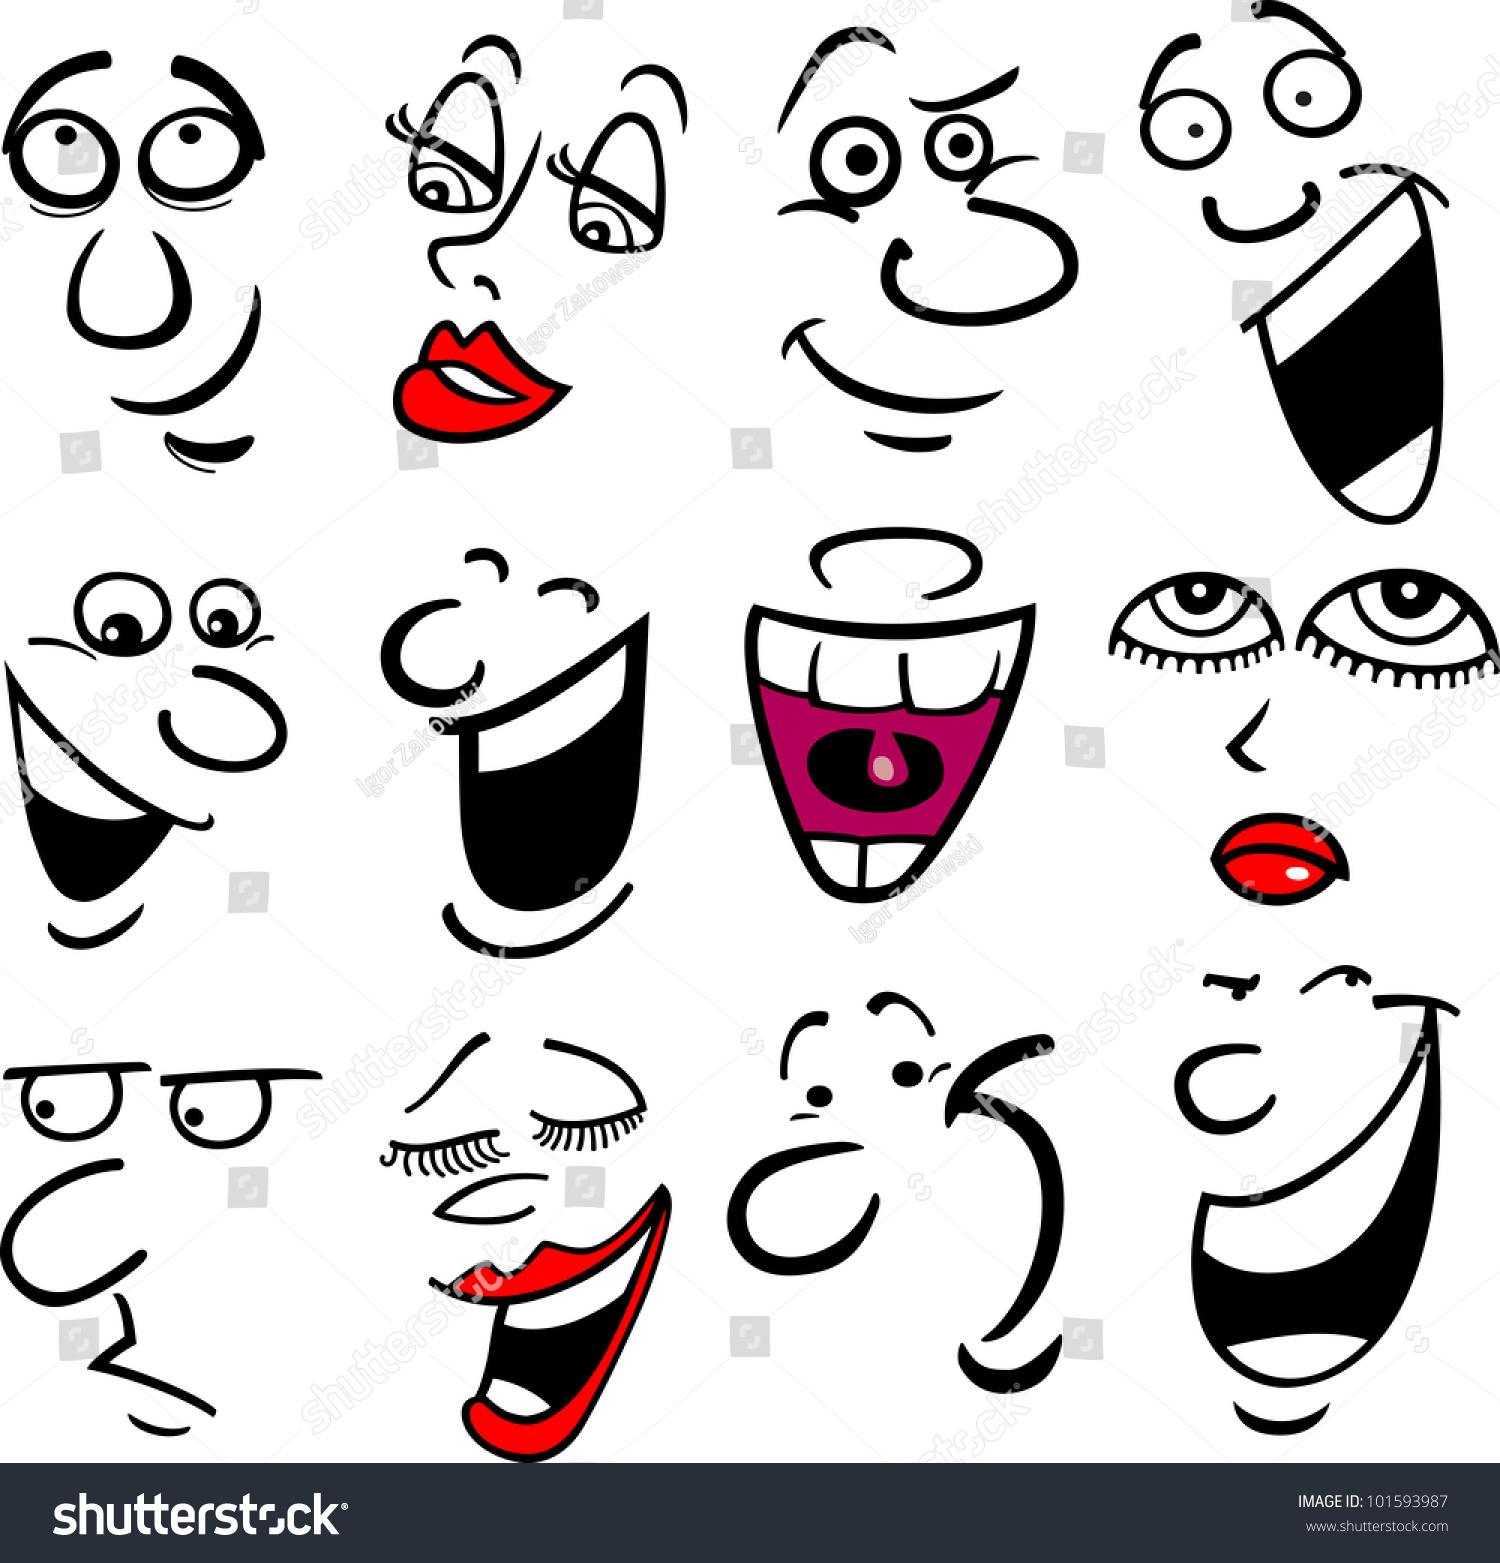 cartoon emotions faces comics humor shutterstock vector pic